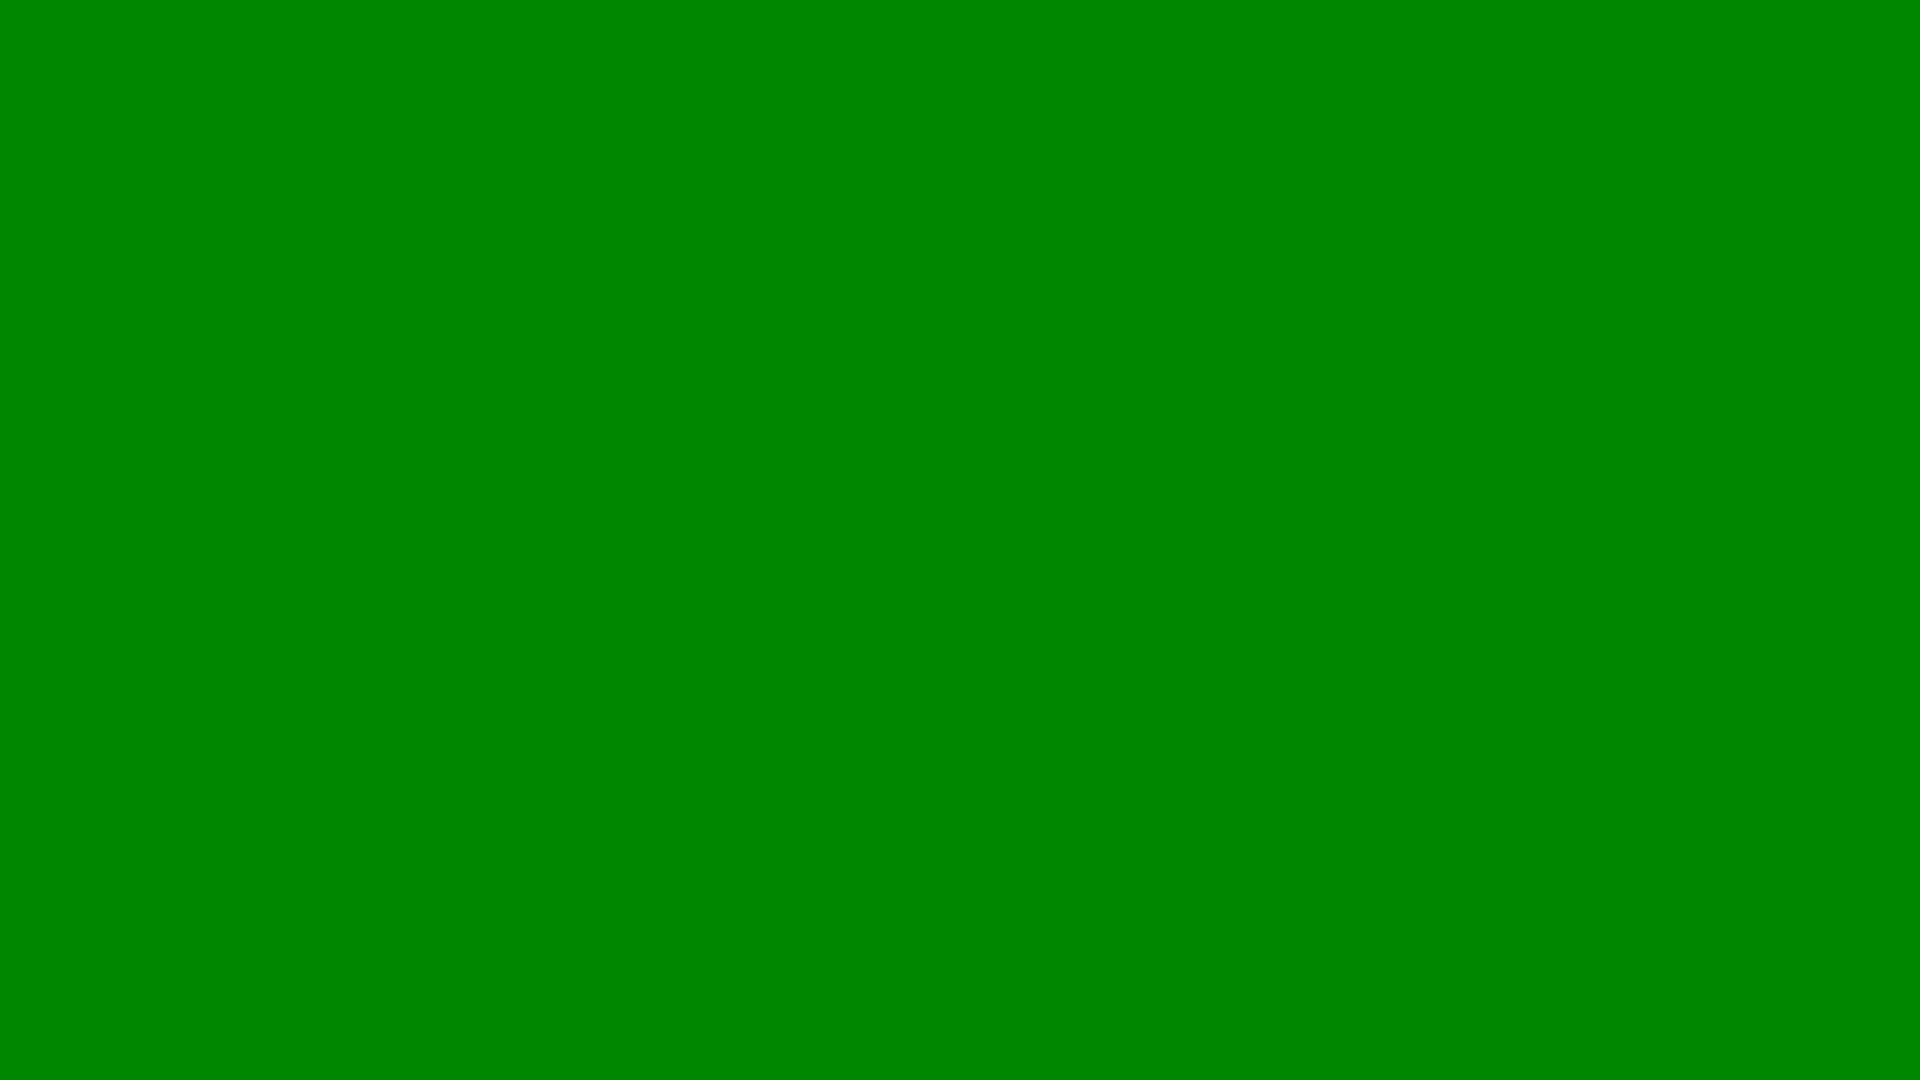 RocketLeagueExchange, GIFs of All Painted Crate Wheels (reddit) GIFs